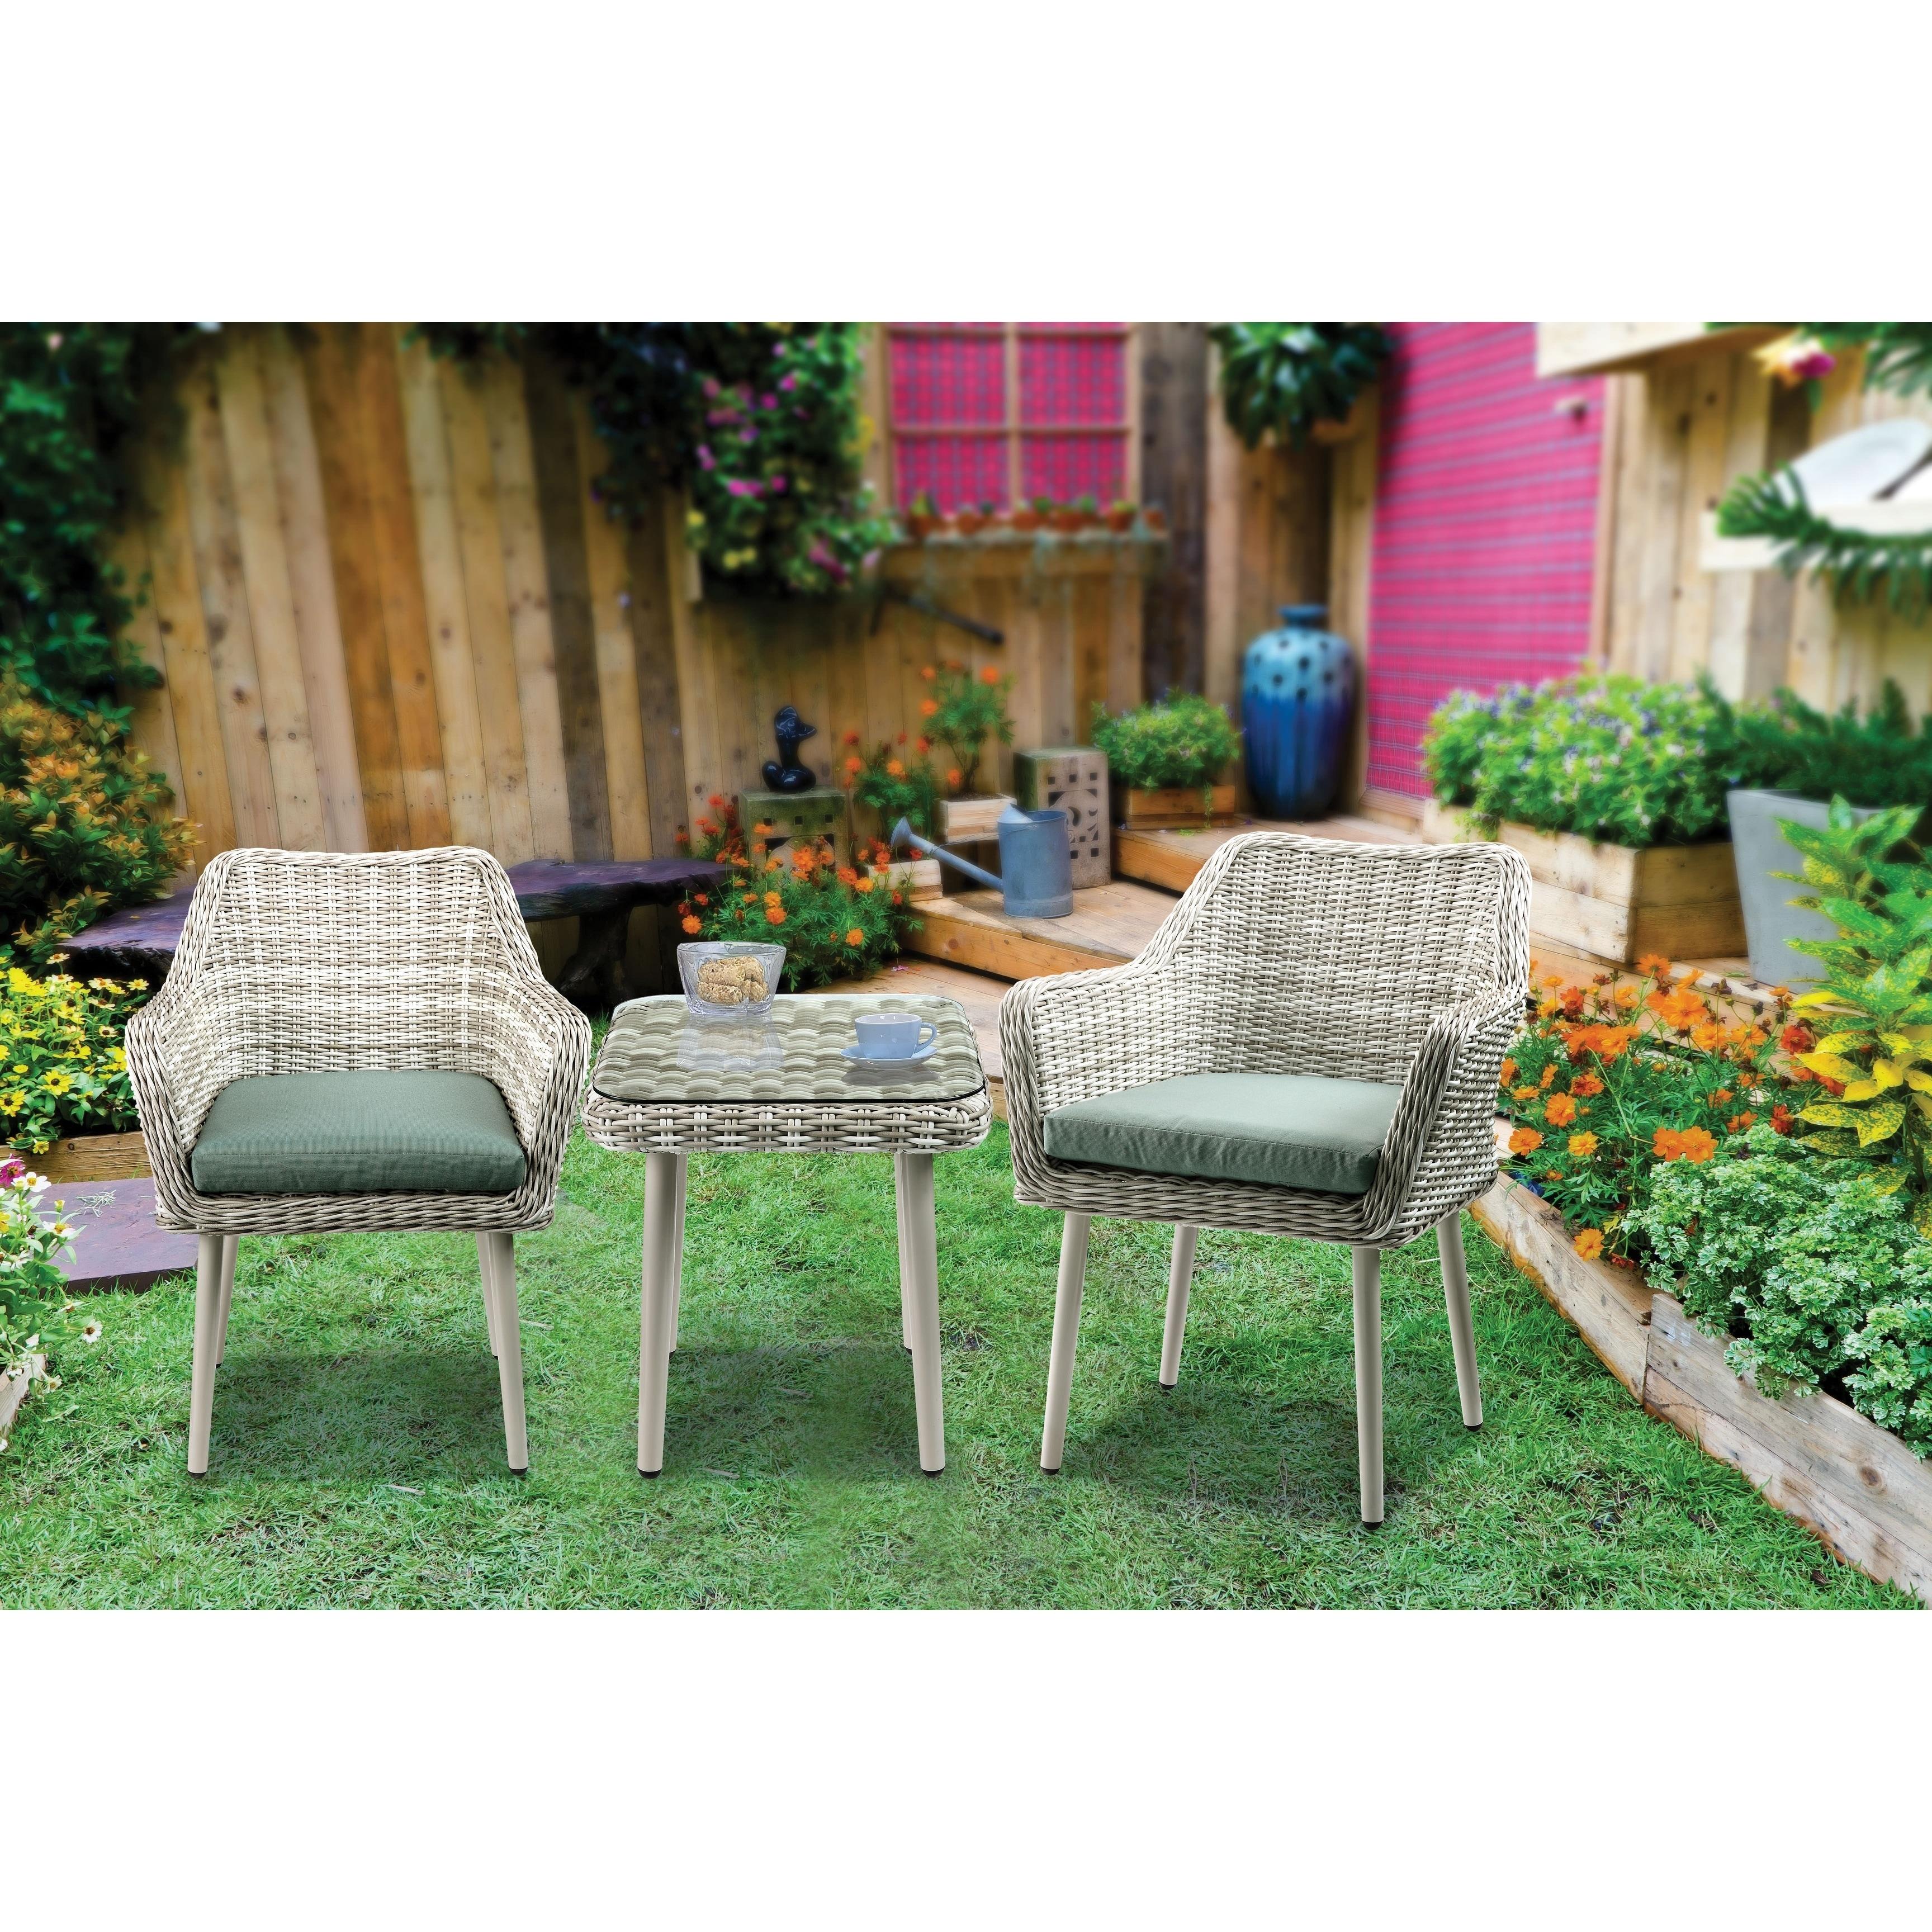 Acme Tashay 3pc Patio Bistro Set Green Fabric Beige Wicker